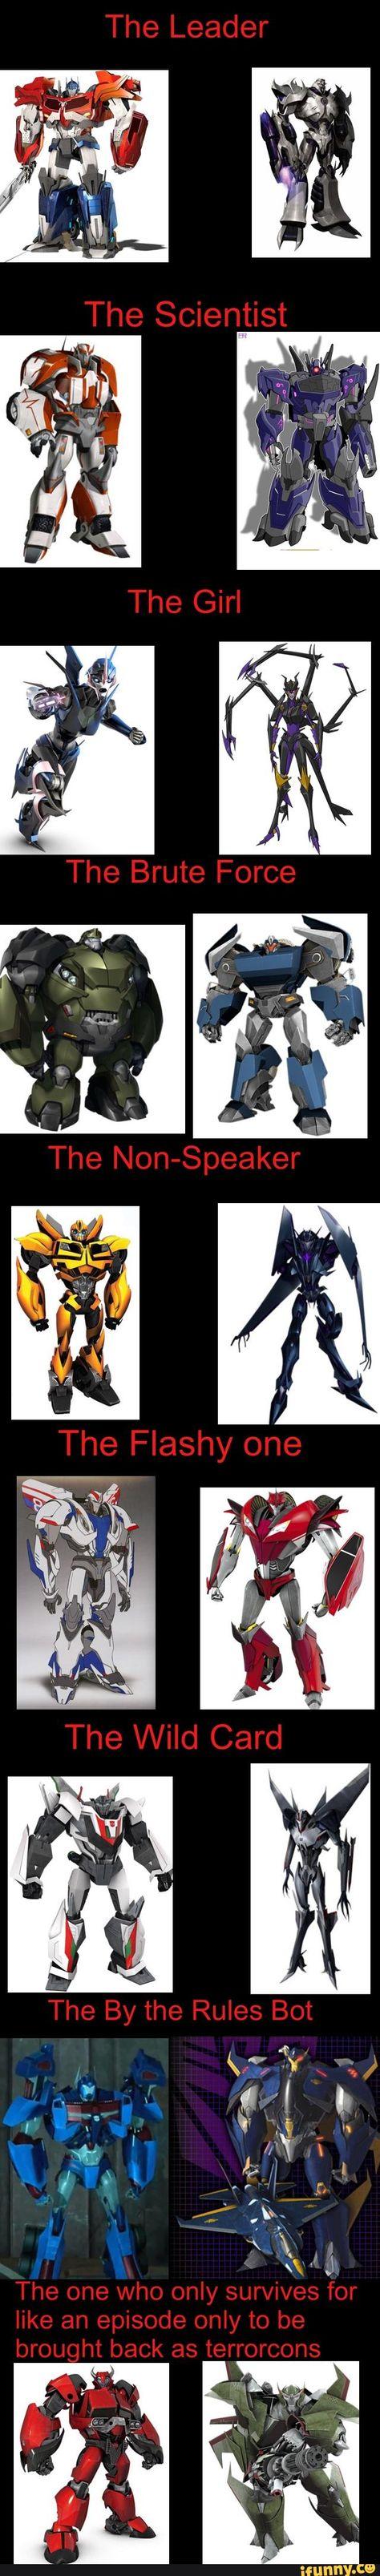 Transformers Fan art and Memes - Random Transformers Memes, Transformers Decepticons, Transformers Characters, Transformers Optimus Prime, Transformers Humanized, Gi Joe, Transformers Collection, Fanart, Girl Humor